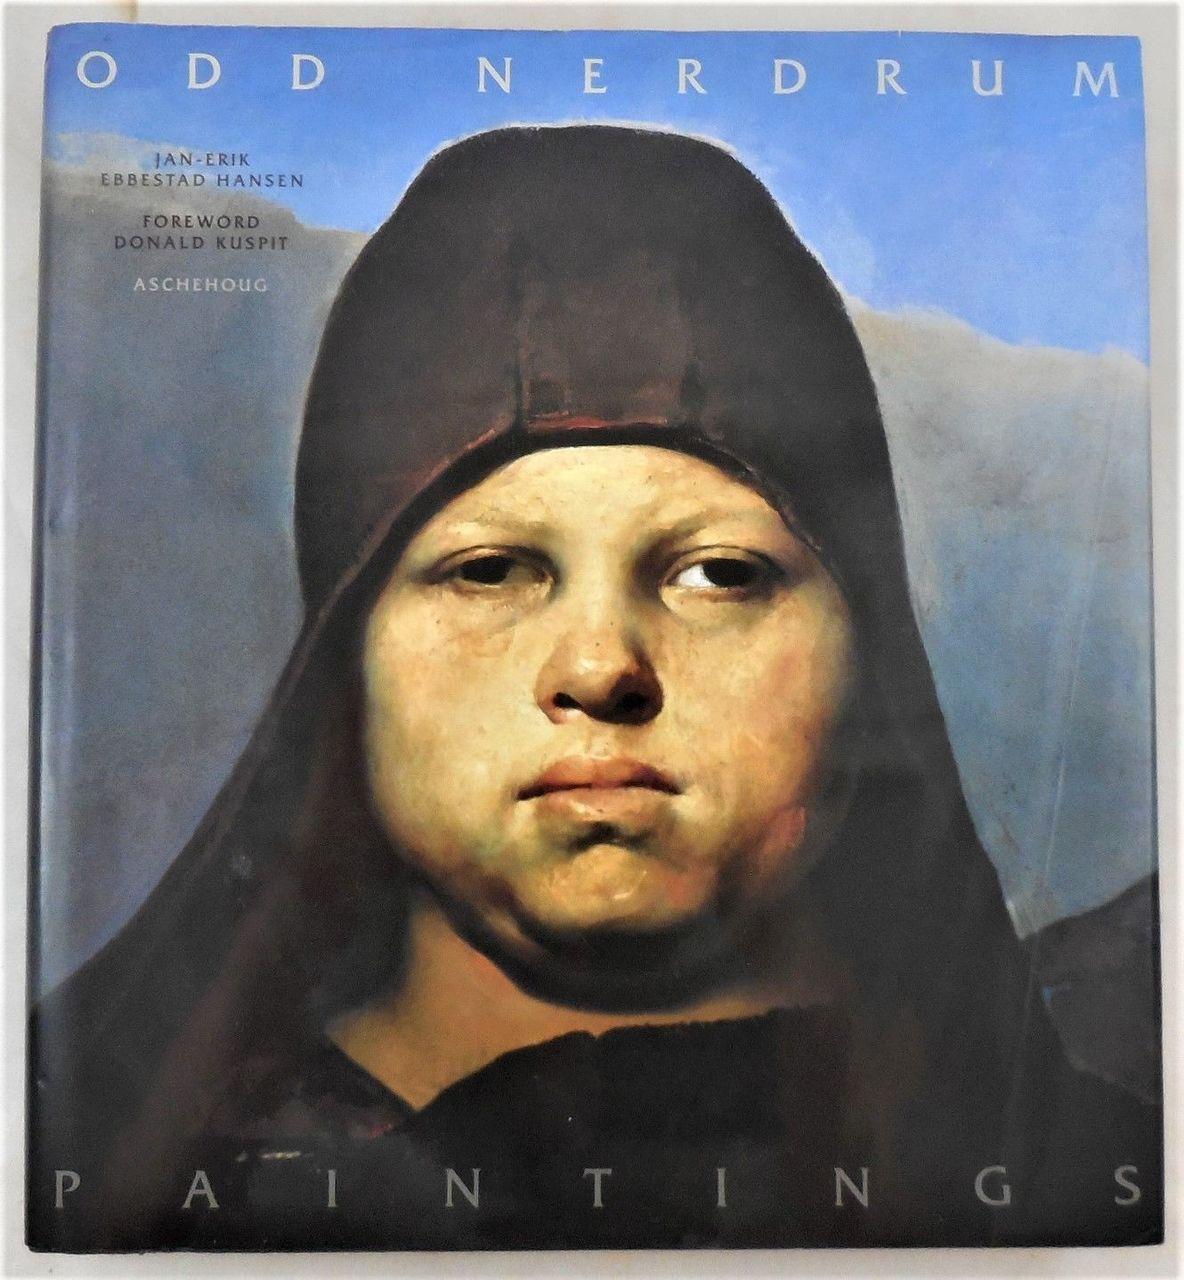 ODD NERDRUM: PAINTINGS, Jan-Erik Ebbestad Hansen, 1996 bio Norwegian scarce DJ